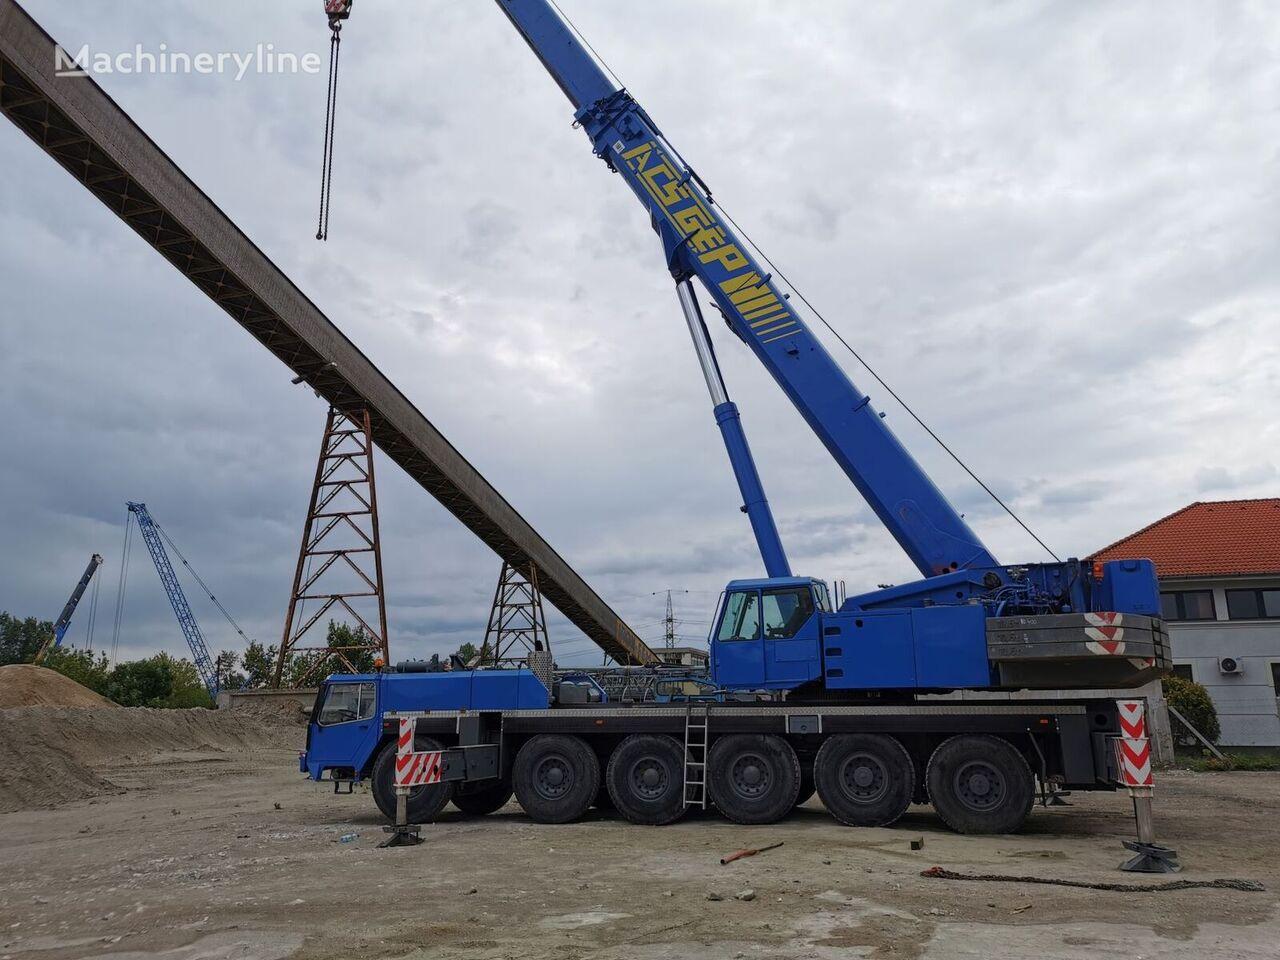 LIEBHERR LTM-1160/1 mobile crane